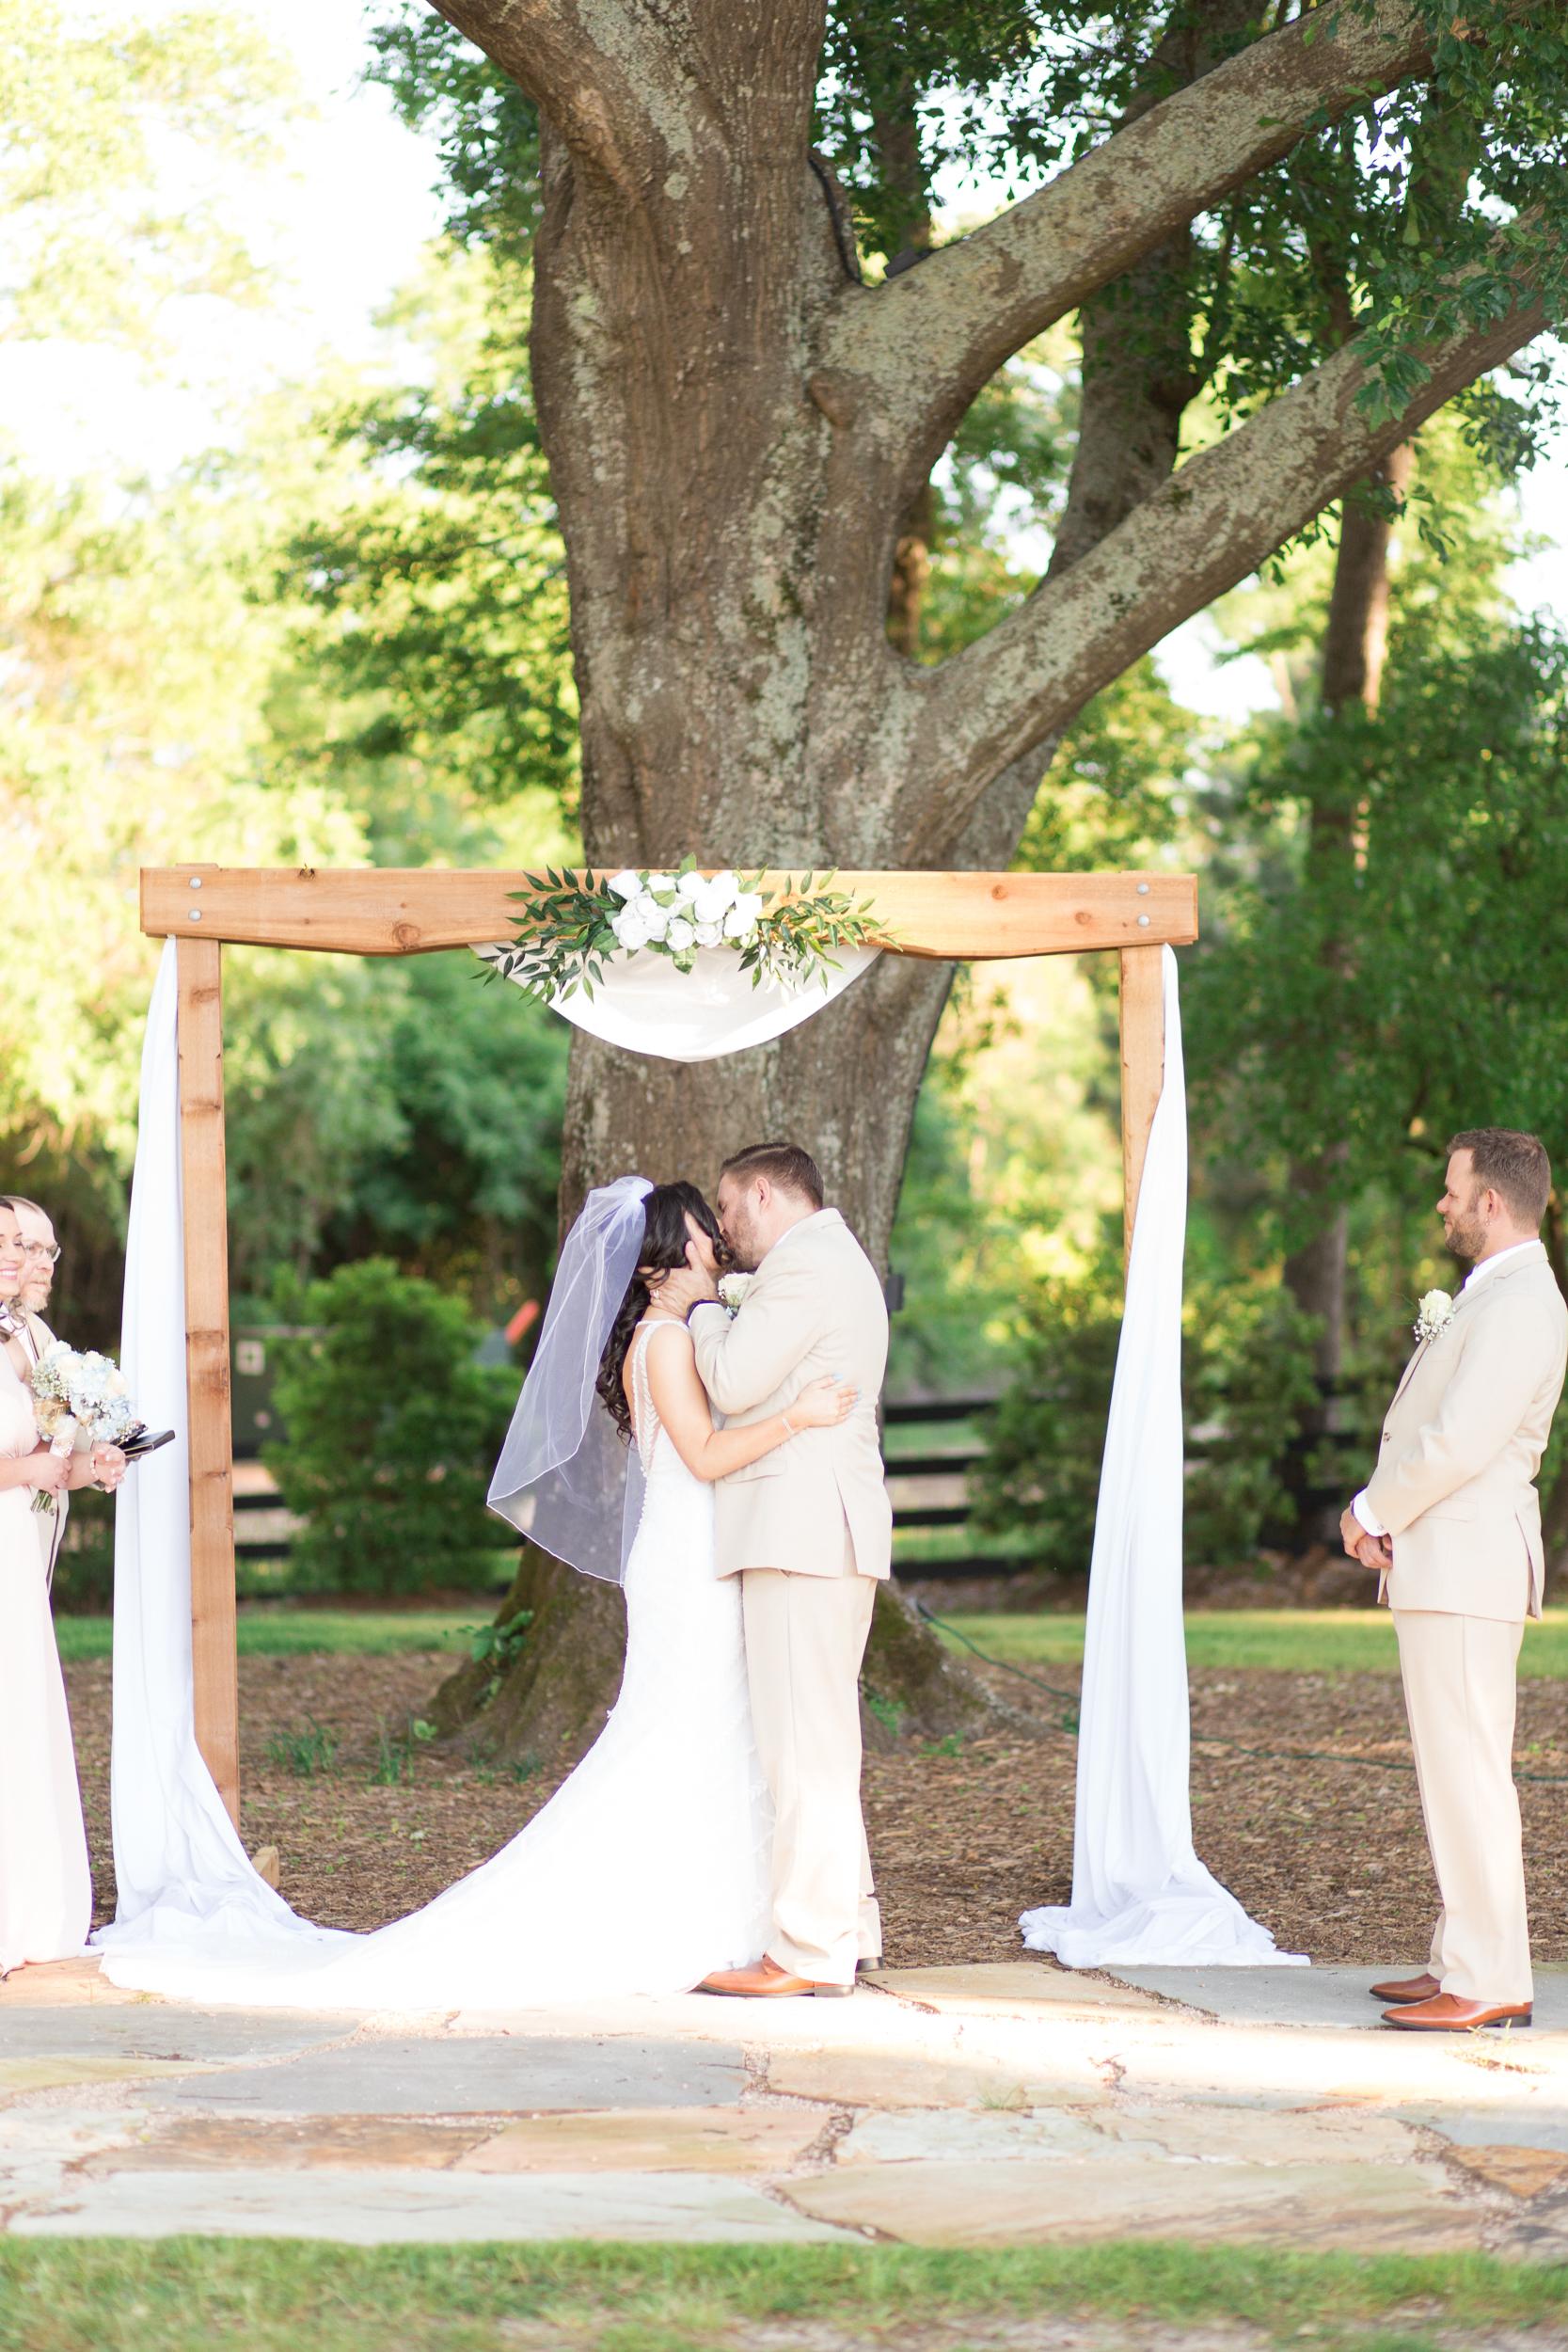 Zihlman-East TX Wedding_Kelsie Hendricks Photography_The Folmar Tyler Texas-109.jpg